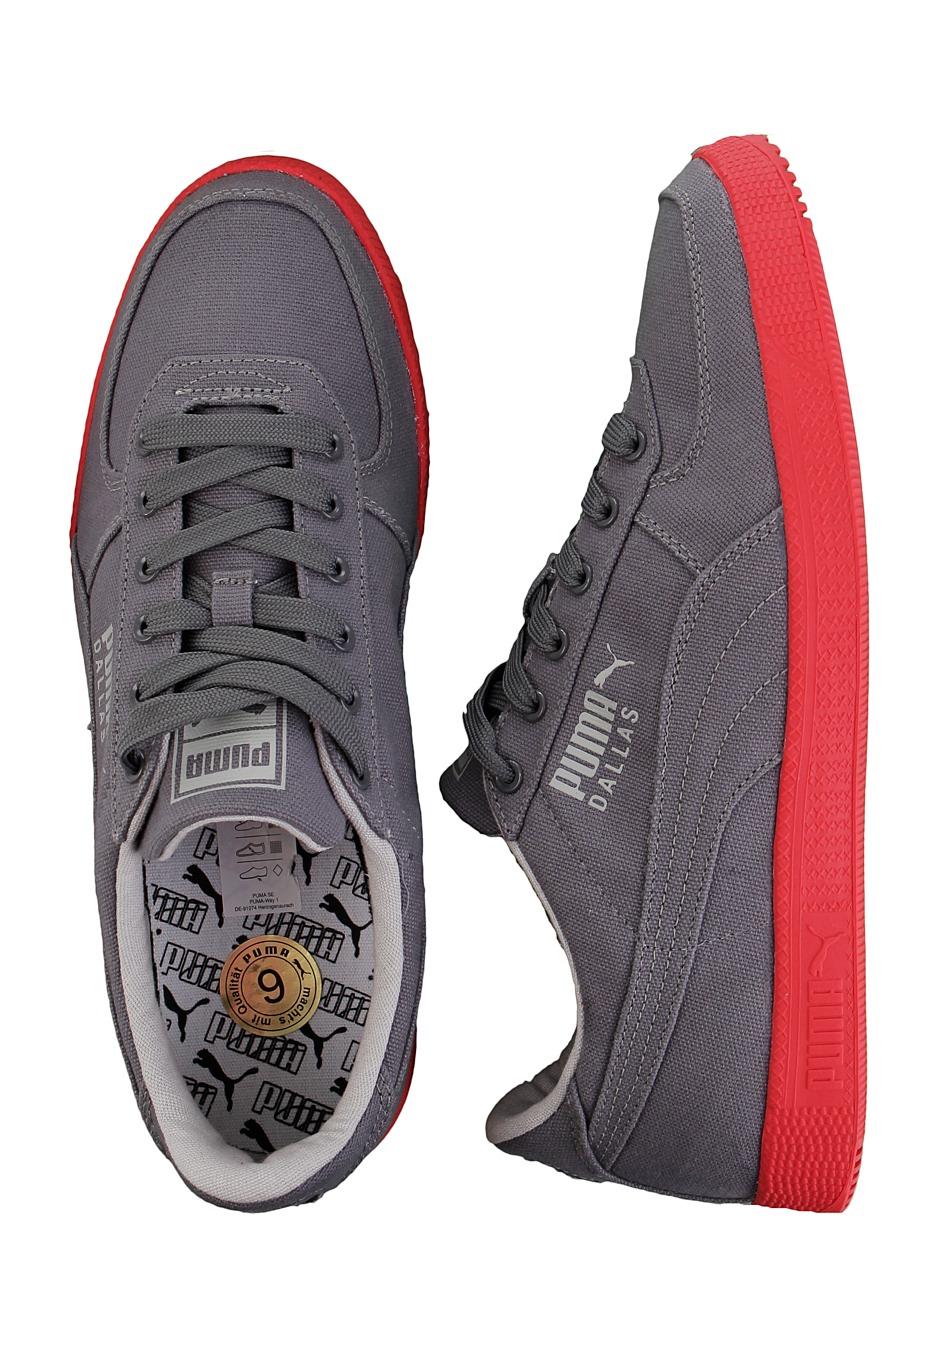 Bittersweet Shoes Australia